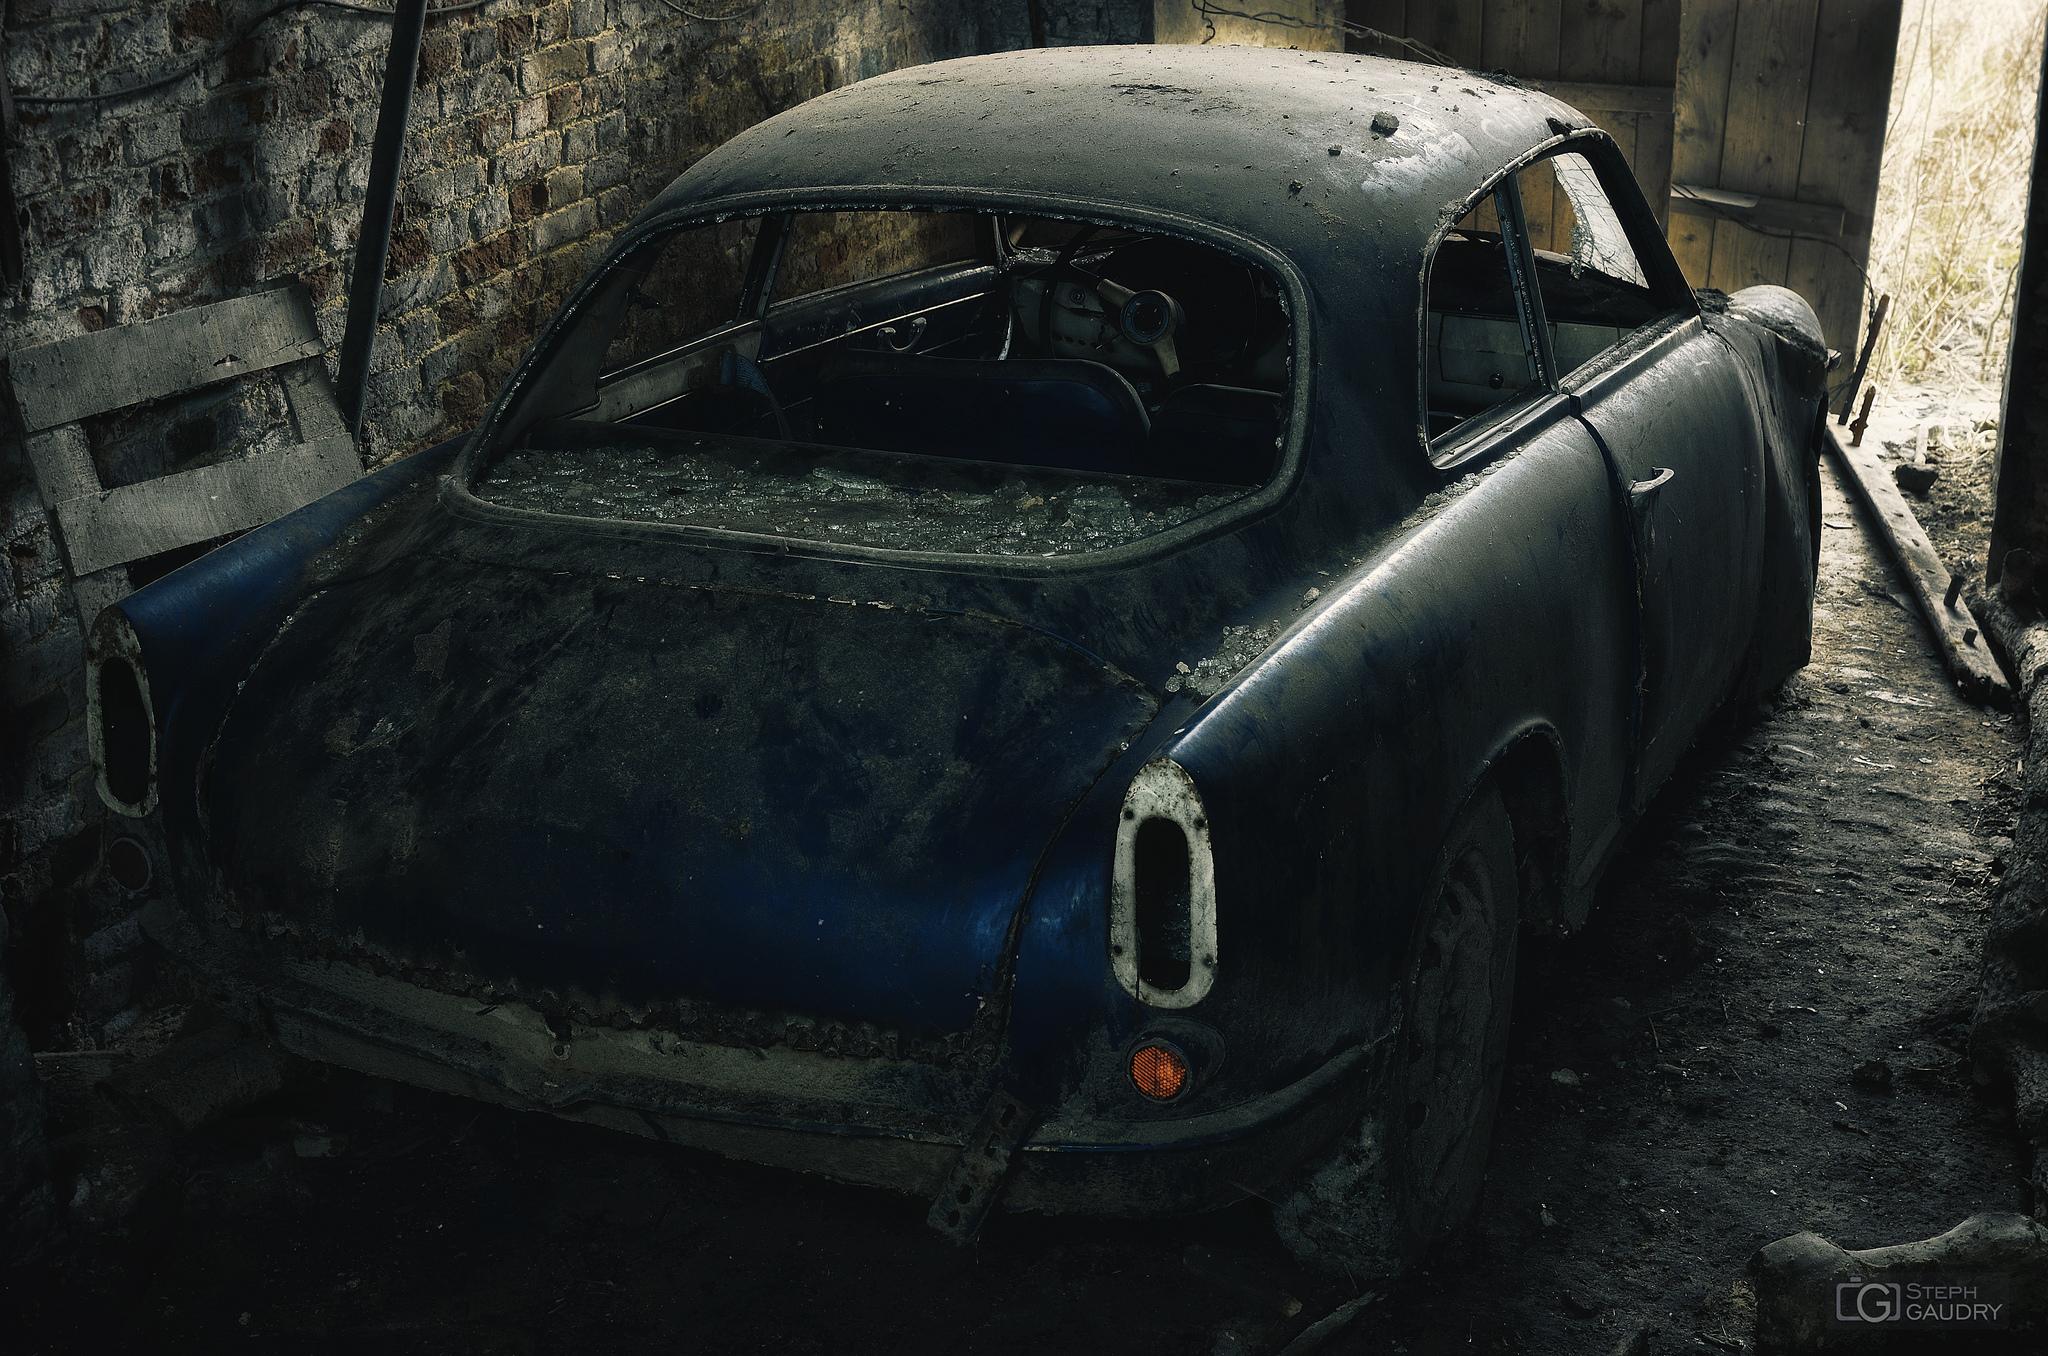 Lost Alfa Romeo [Cliquez pour lancer le diaporama]